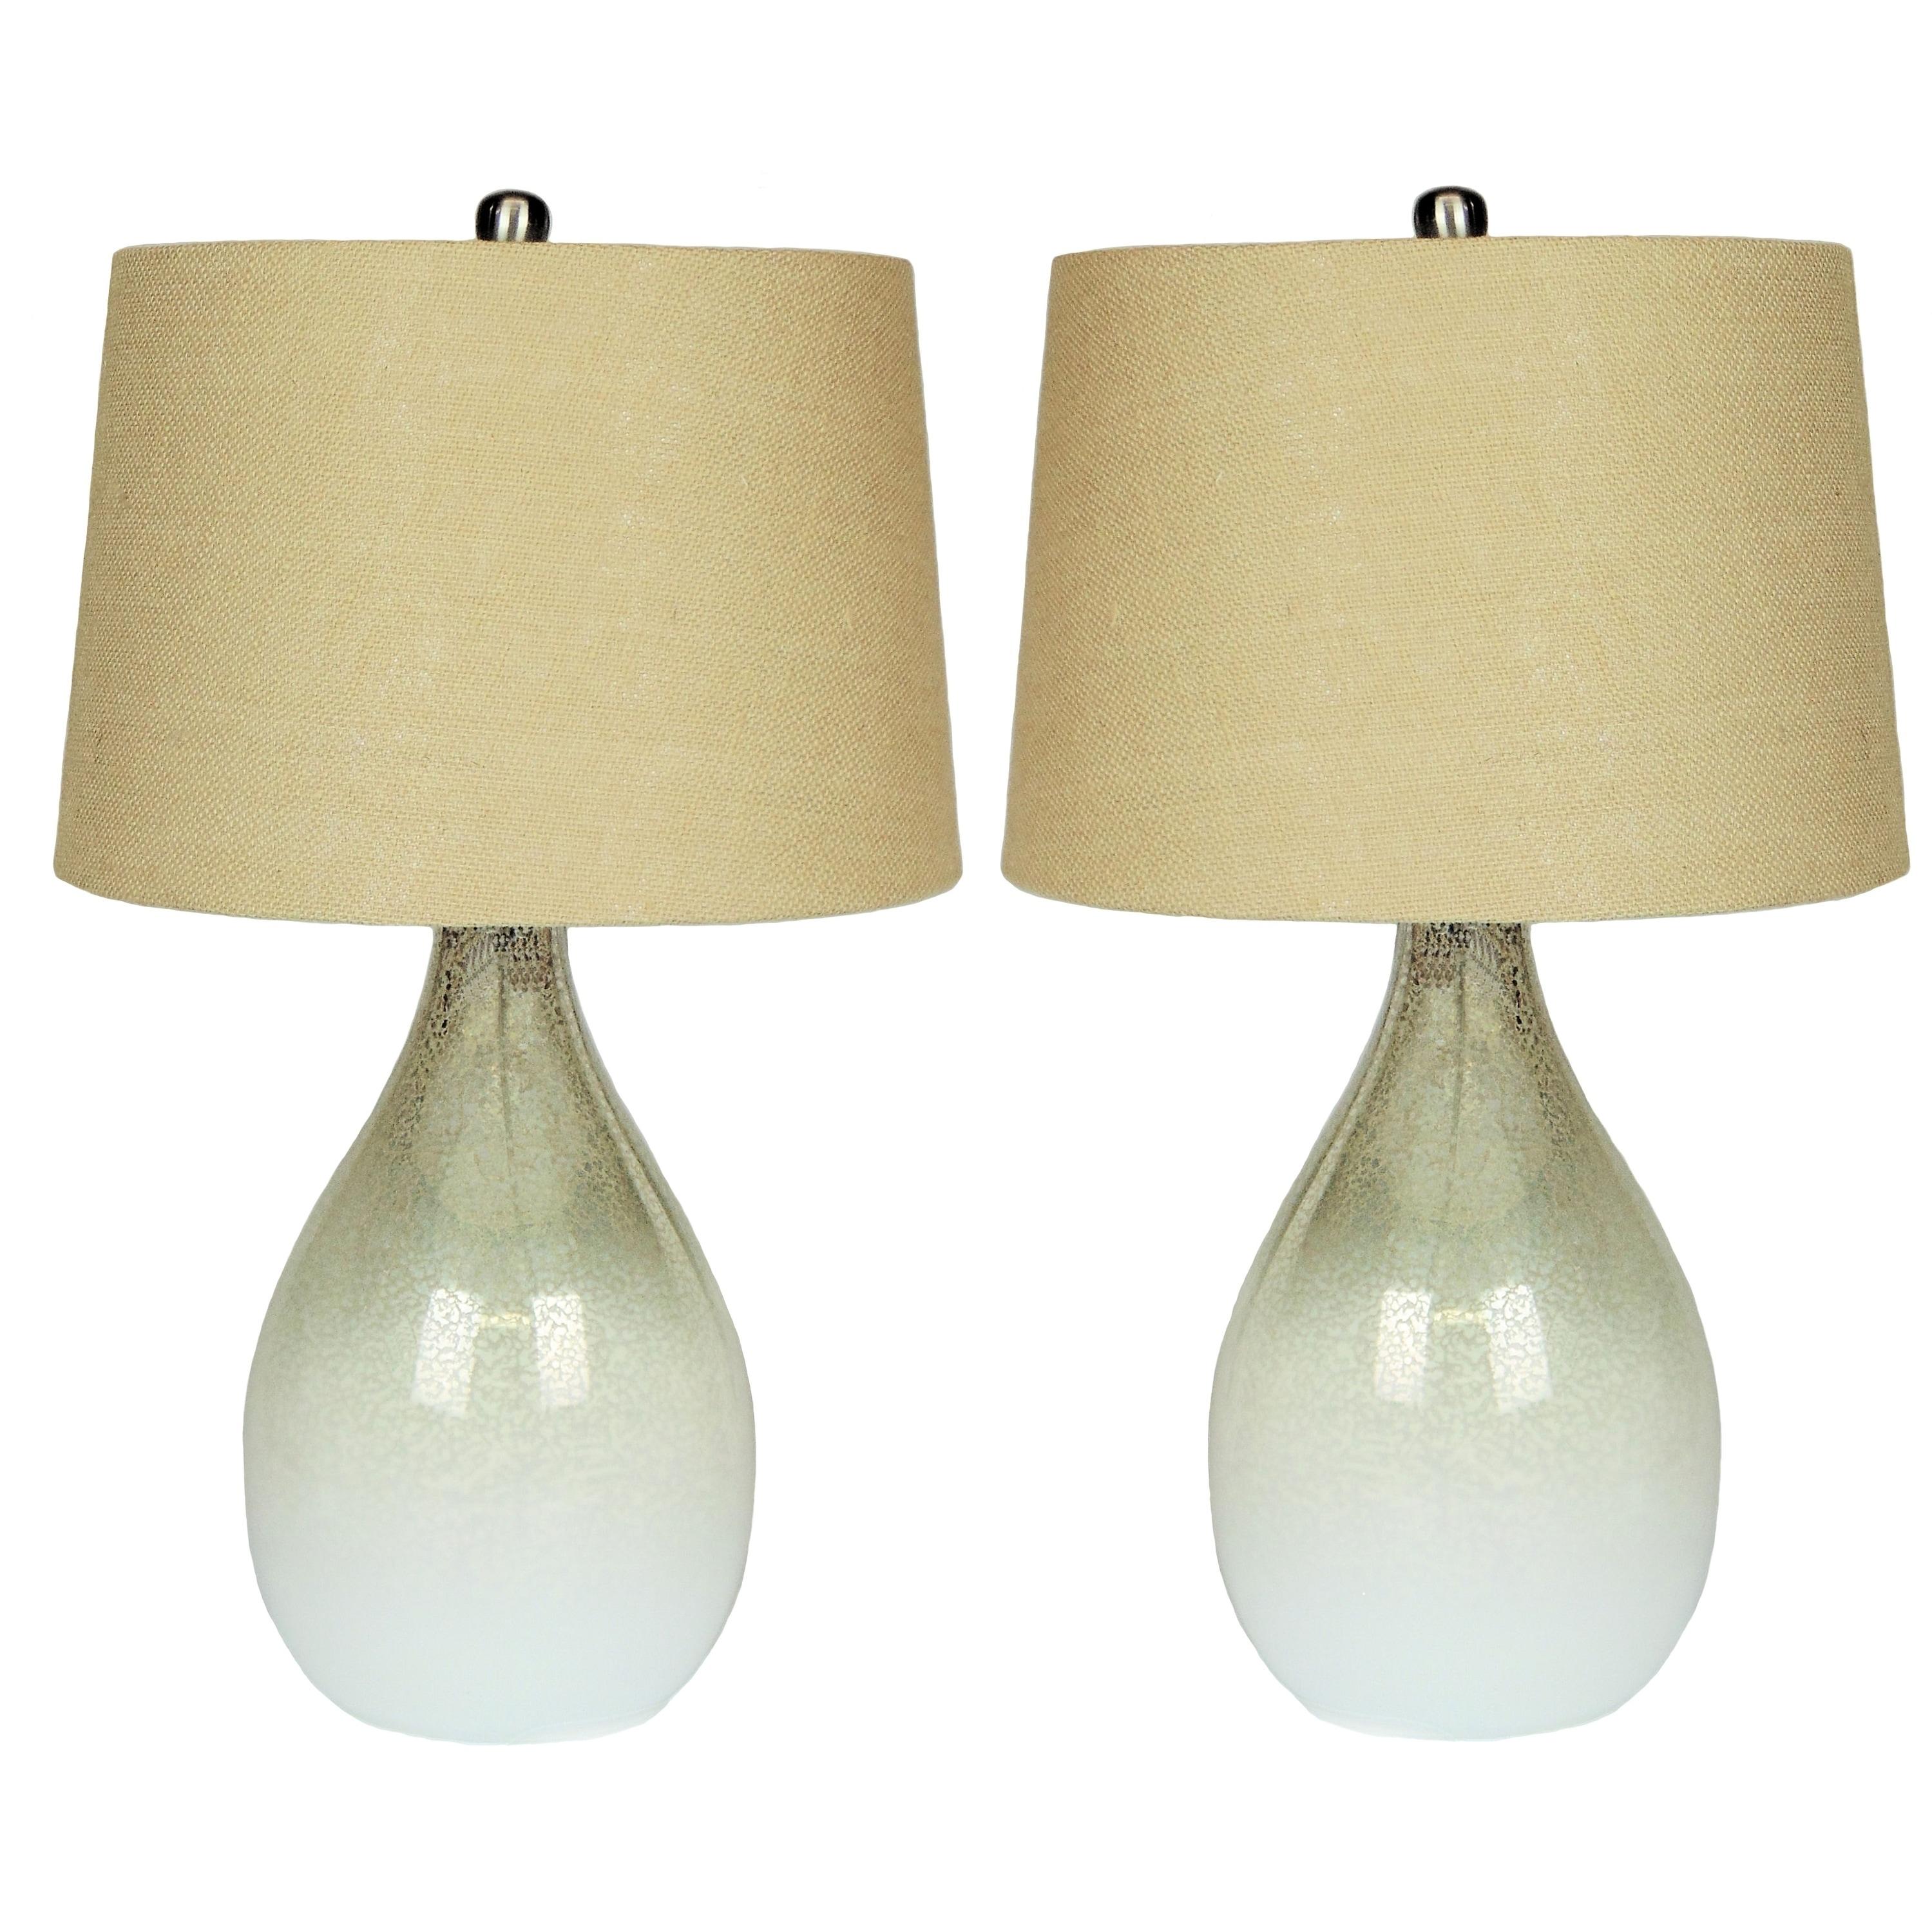 Shop Daliana Set of 2 Mercury Glass Table Lamp Set - 24 inches ...